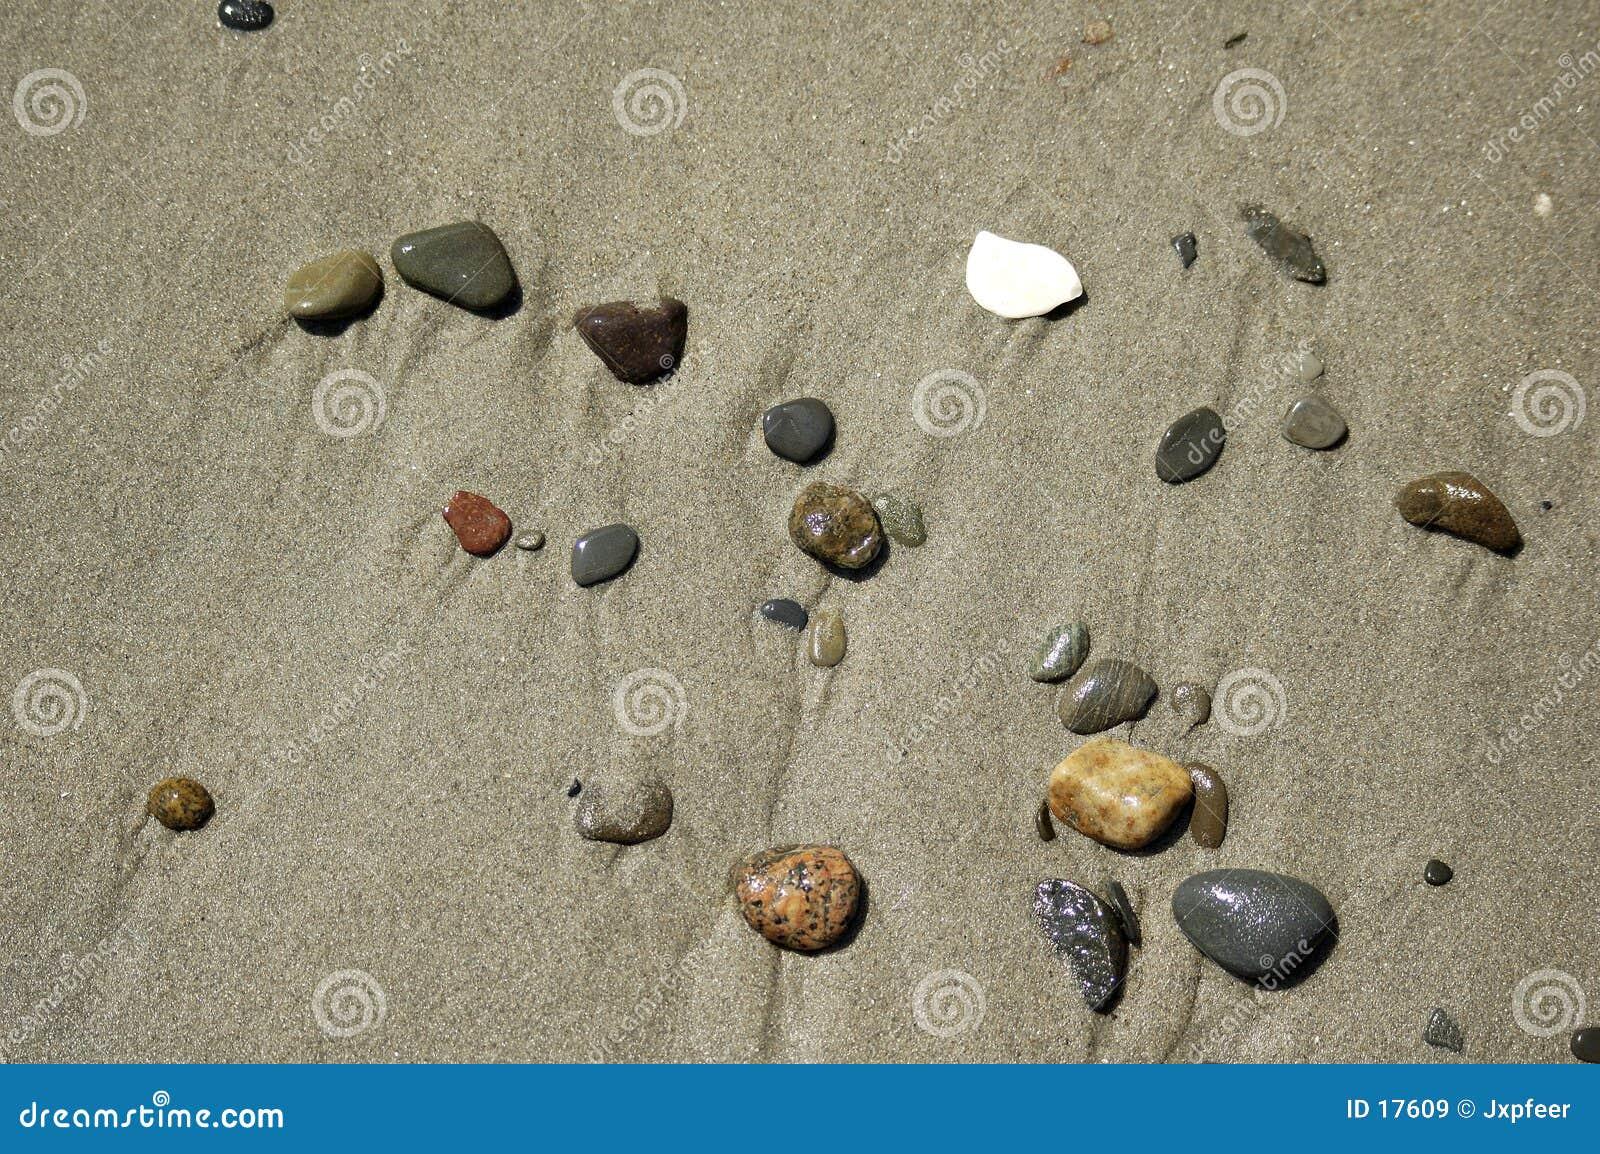 Beach scene - pebbles in the sand